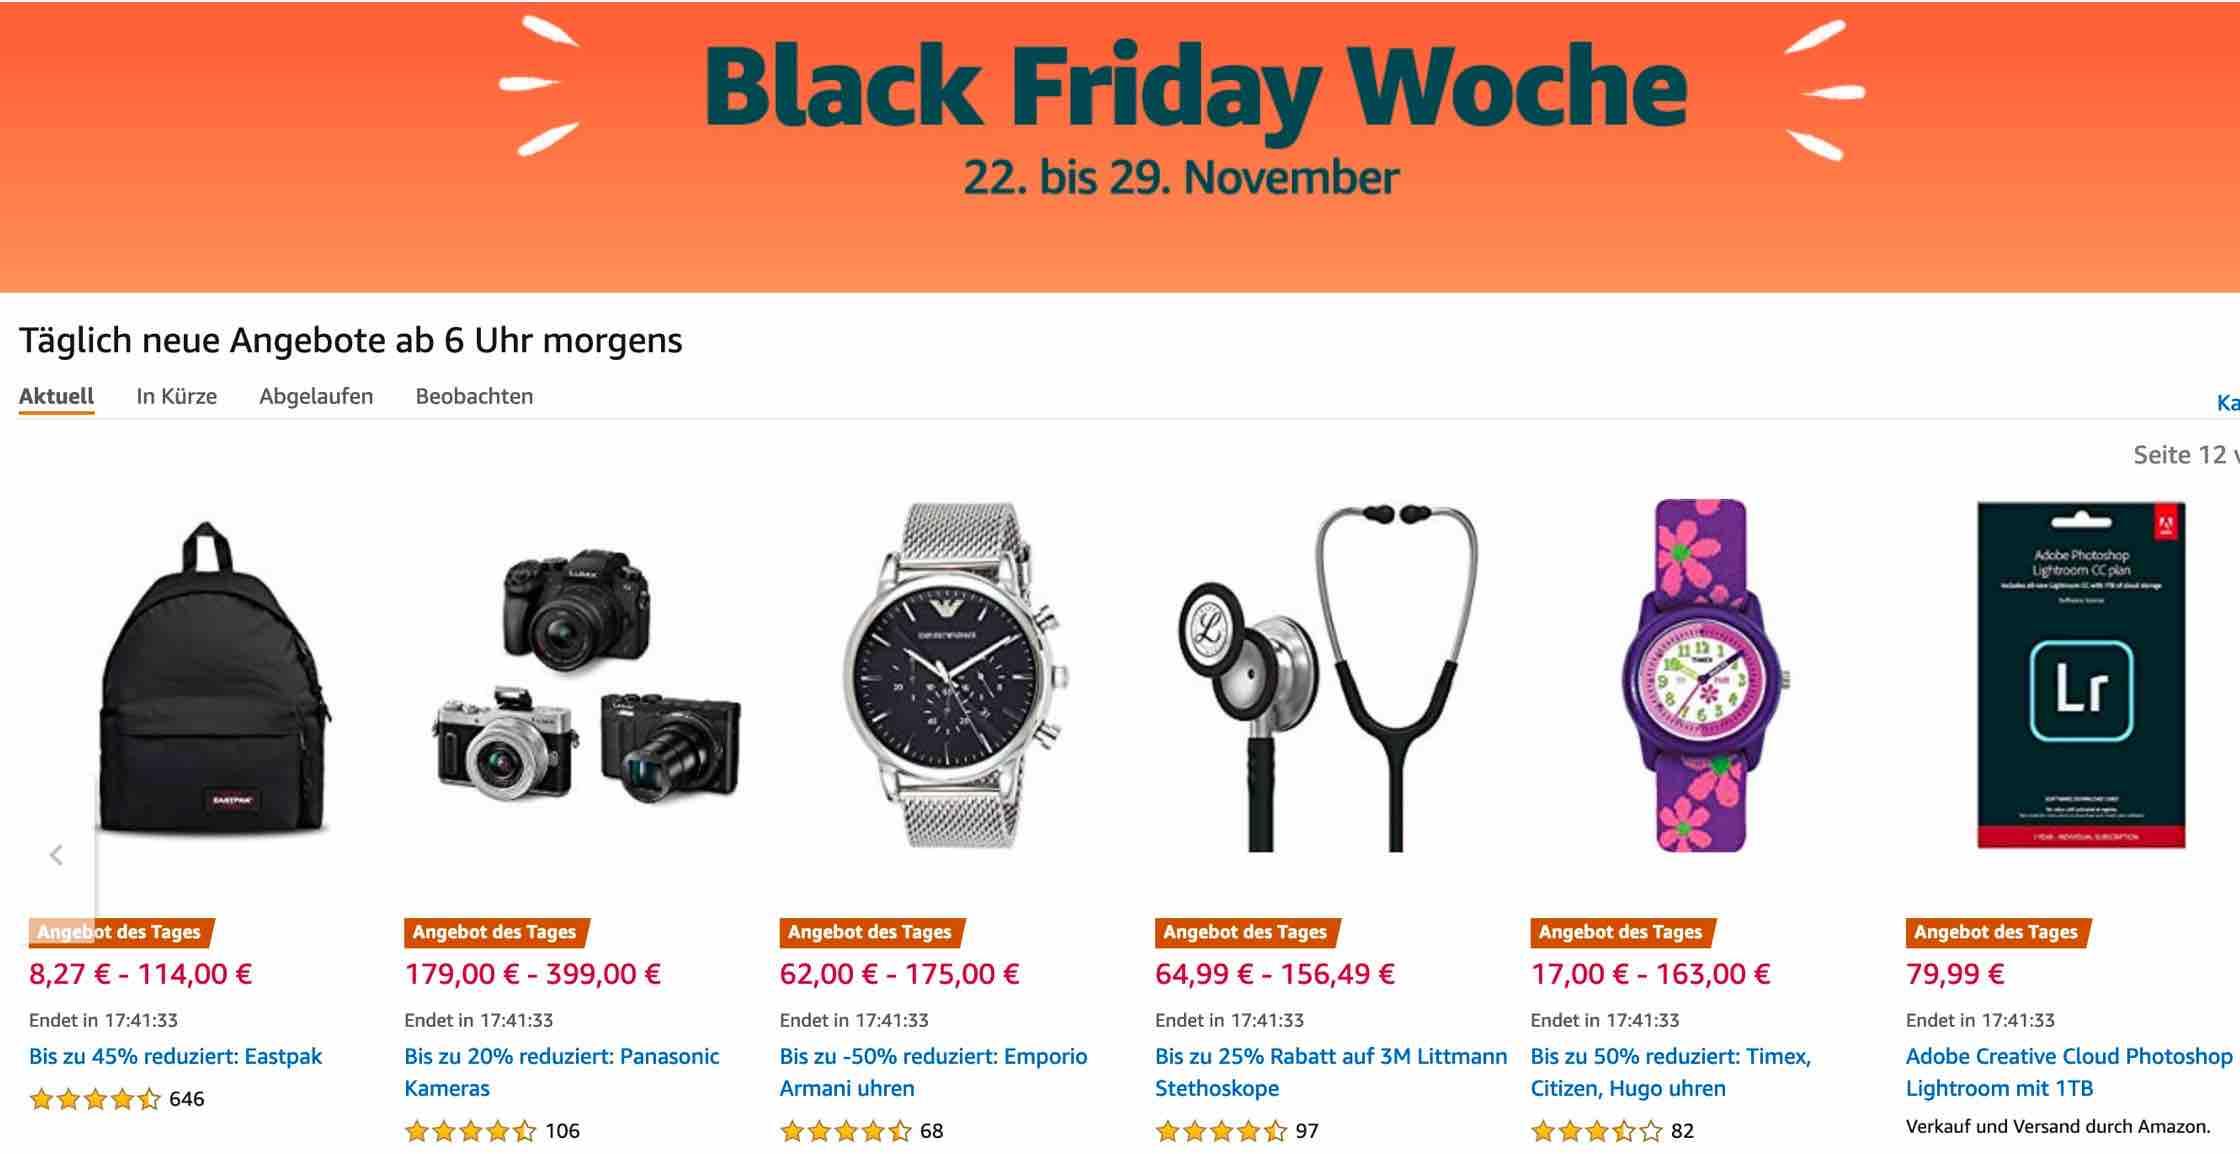 Black Friday Deals Start Now At Amazon Europe Keh Black Friday Flash Deal Fuji Rumors